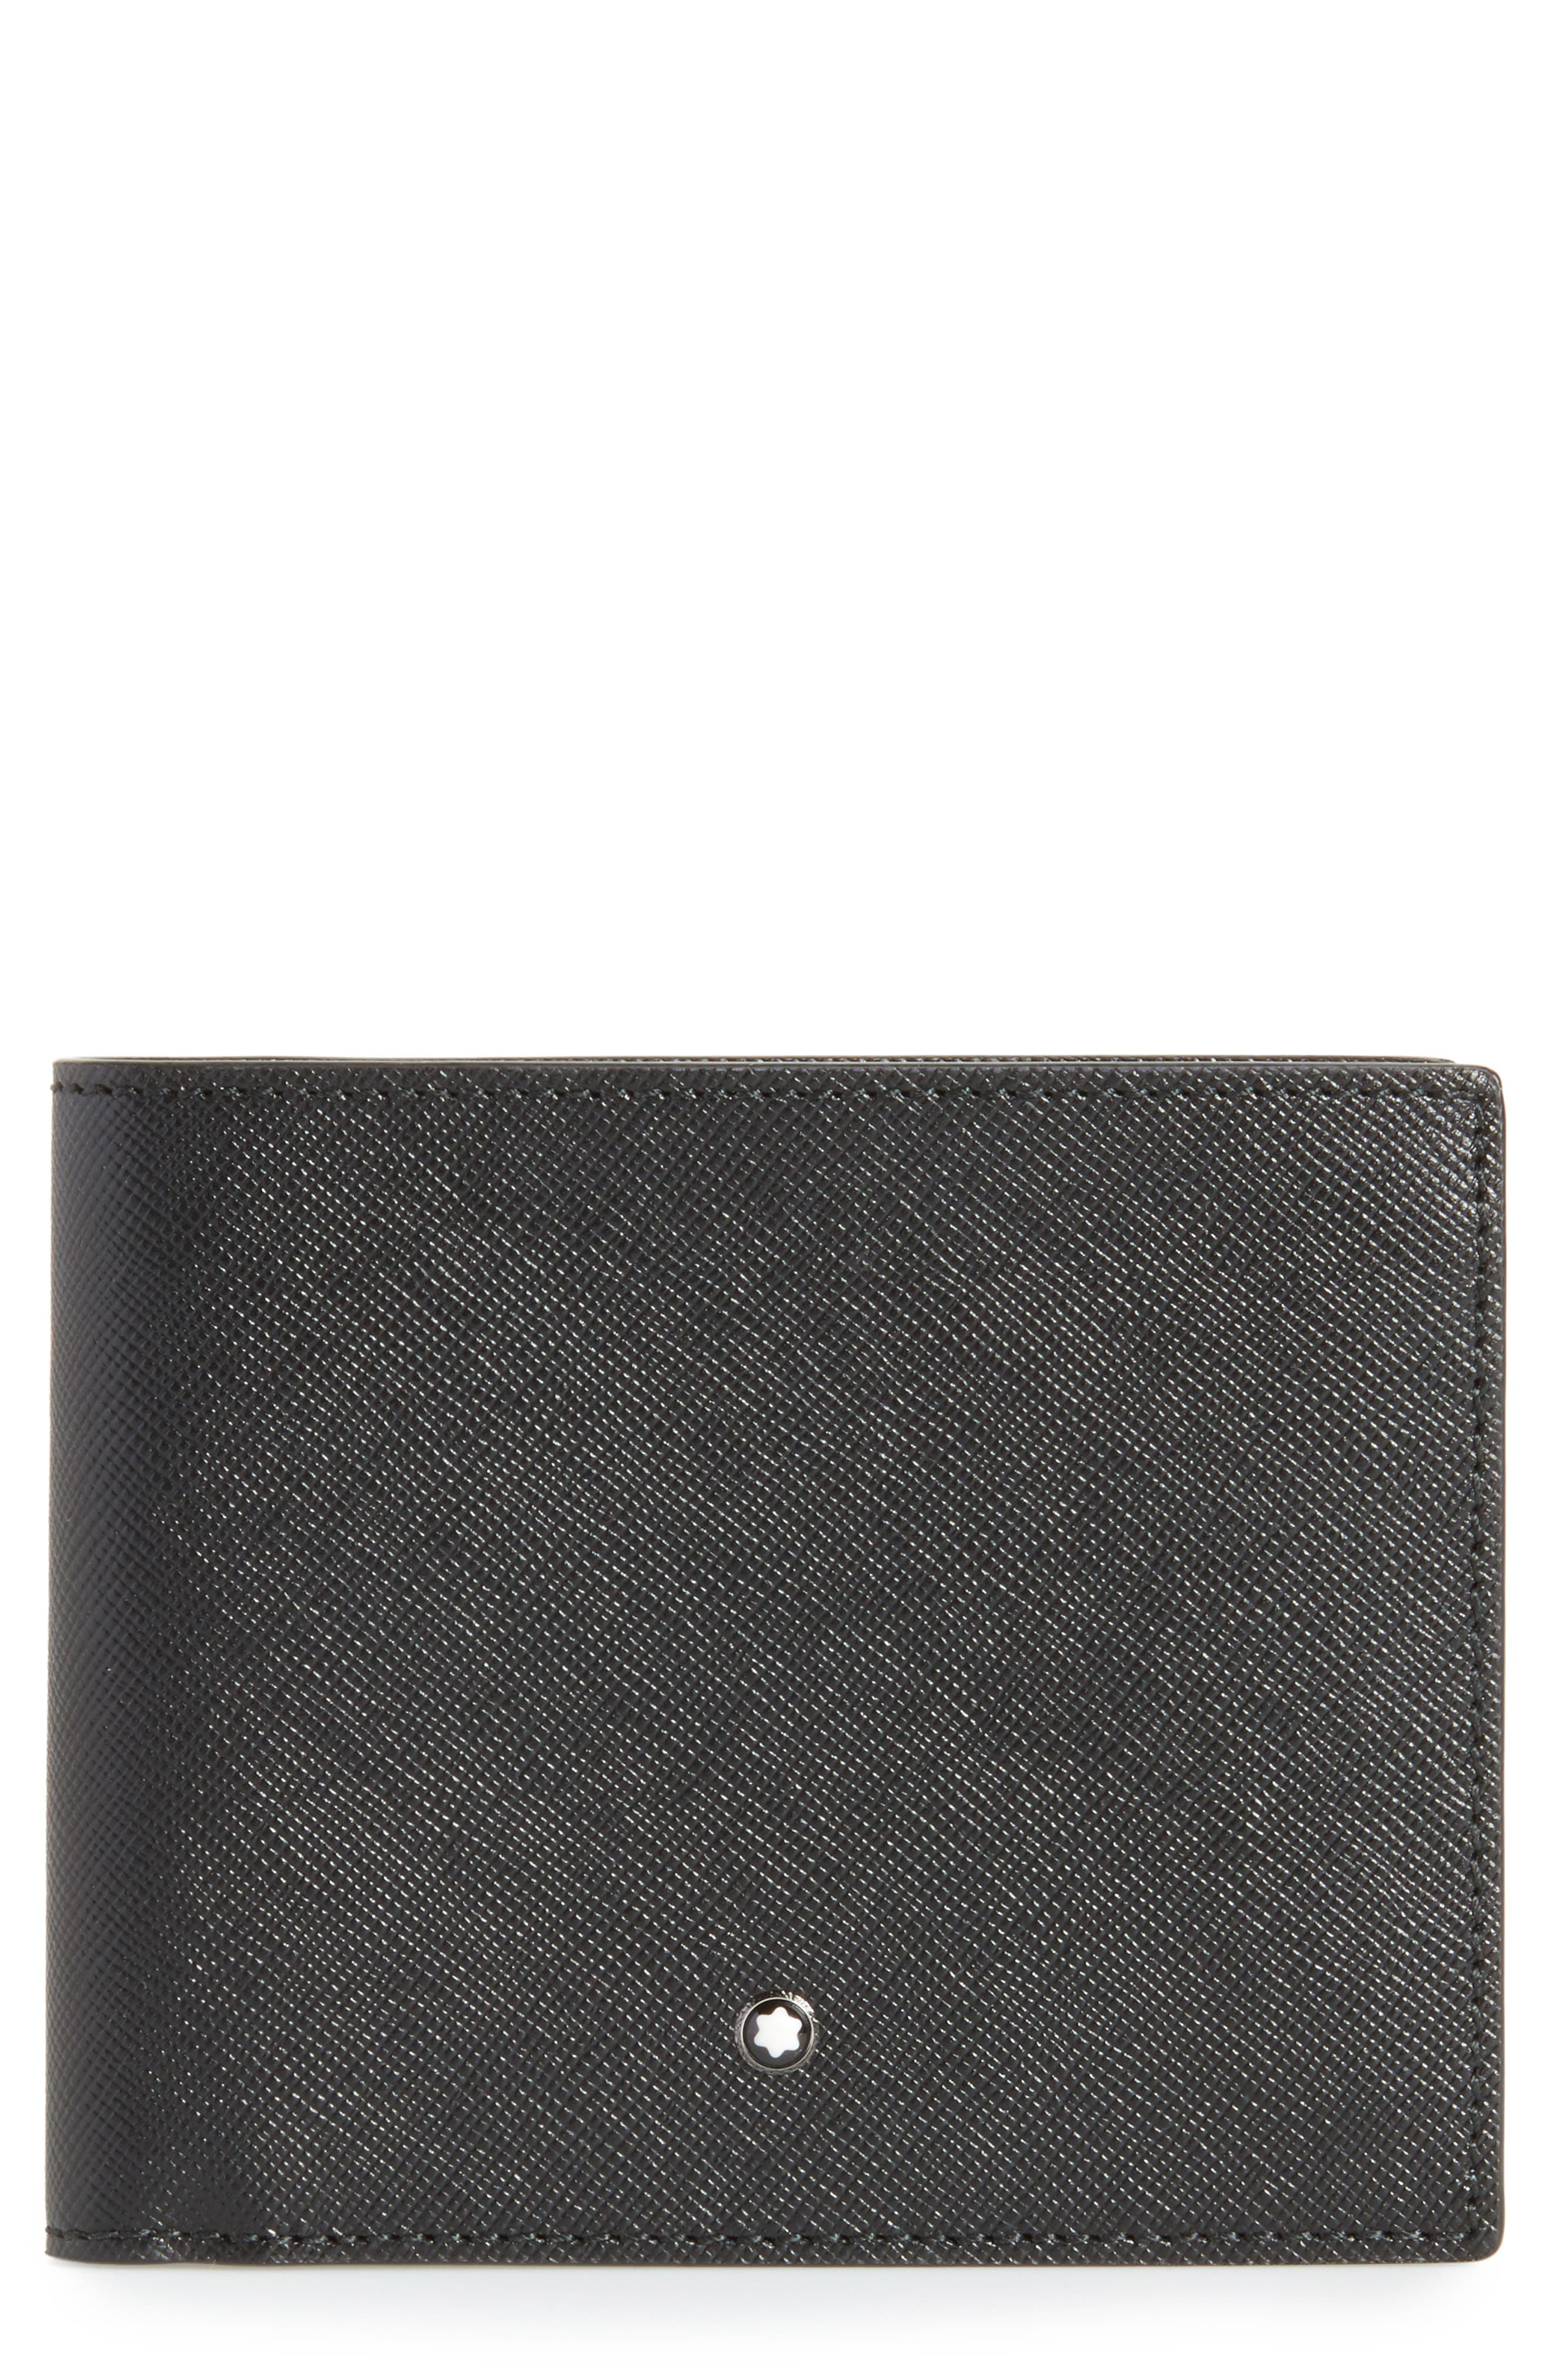 Sartorial Leather Wallet,                             Main thumbnail 1, color,                             BLACK